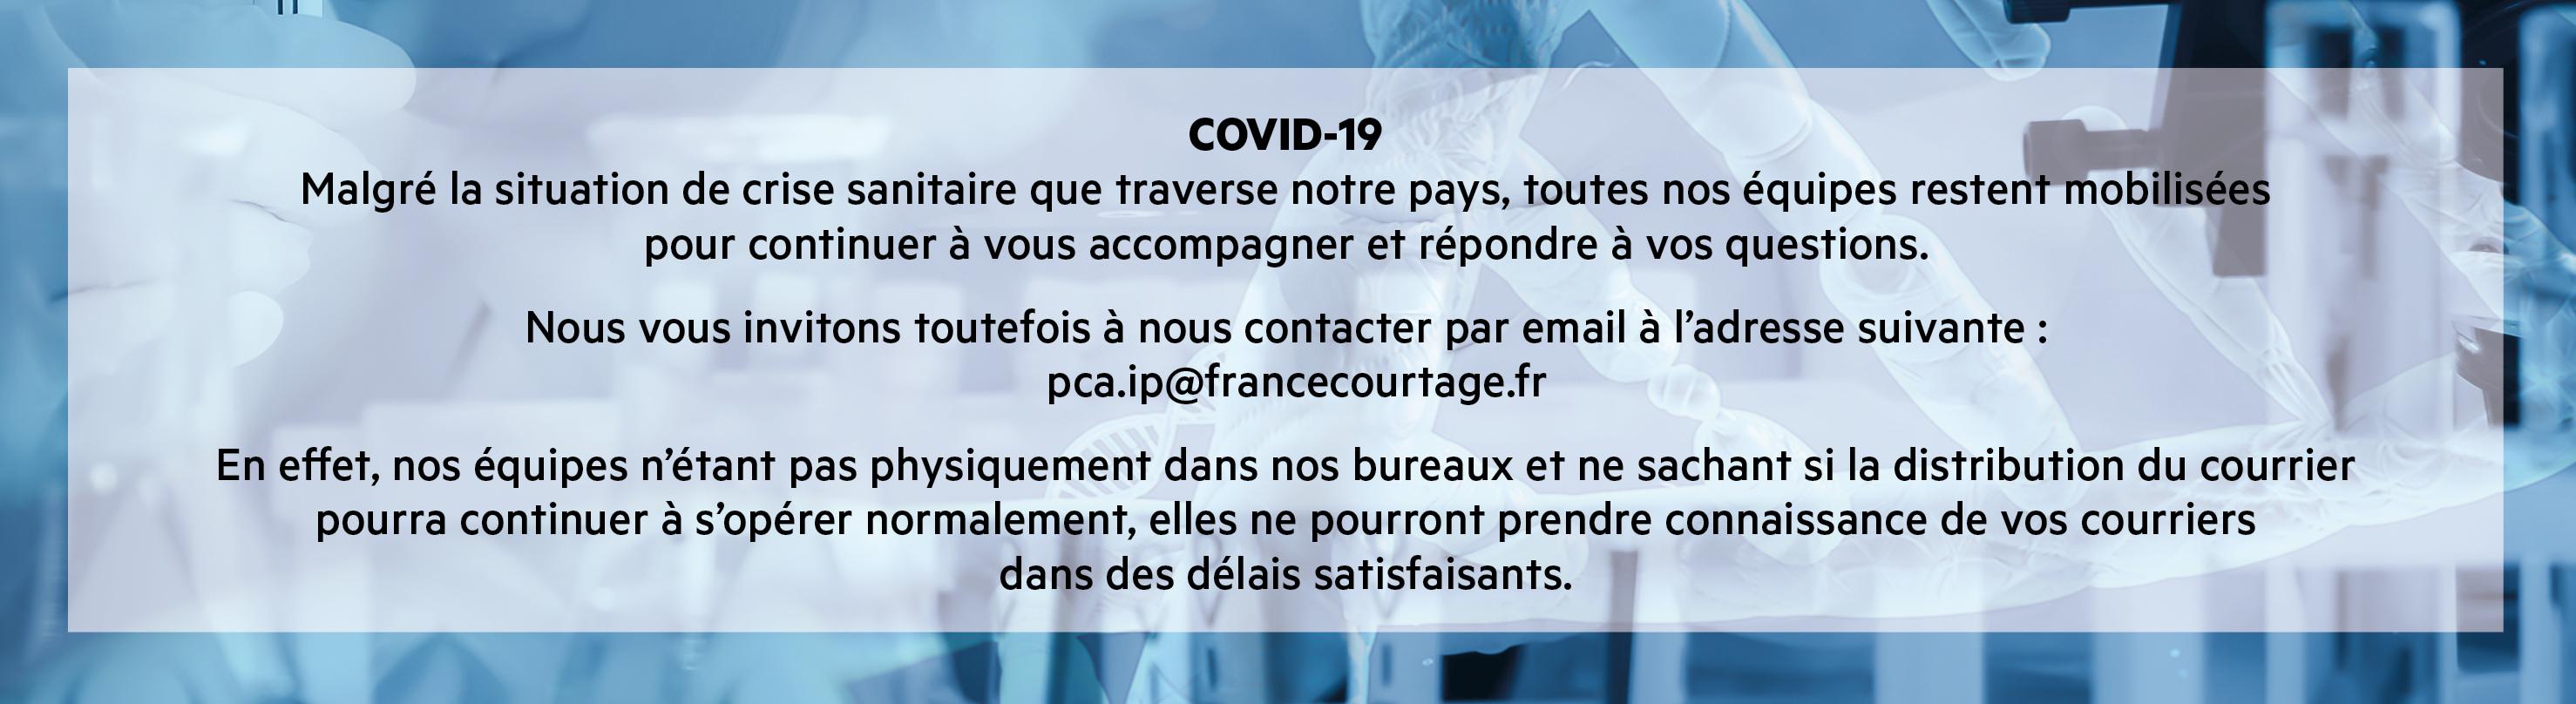 GFC-COVID19-ip